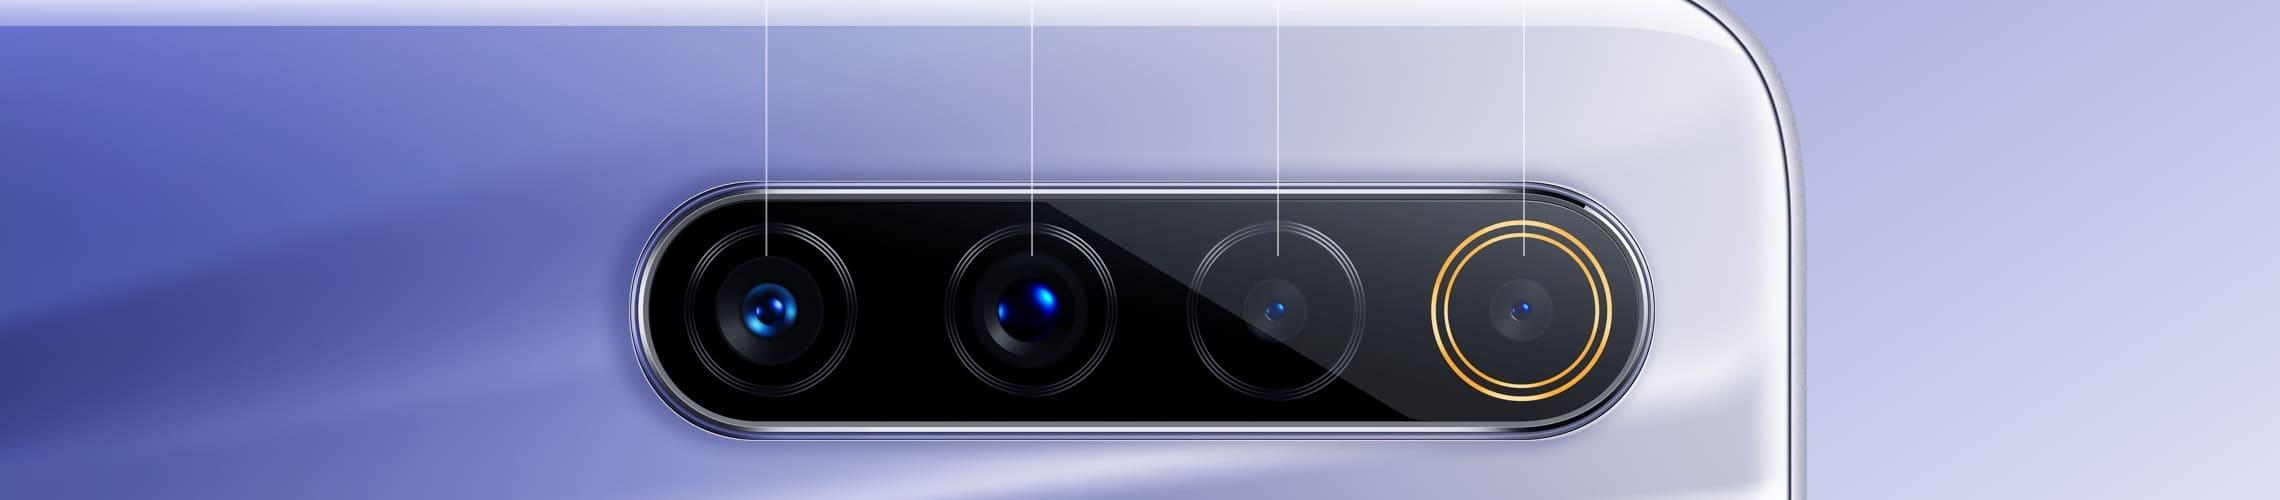 Realme X50m 5G: новинка с квадрокамерой и 120 Гц дисплеем